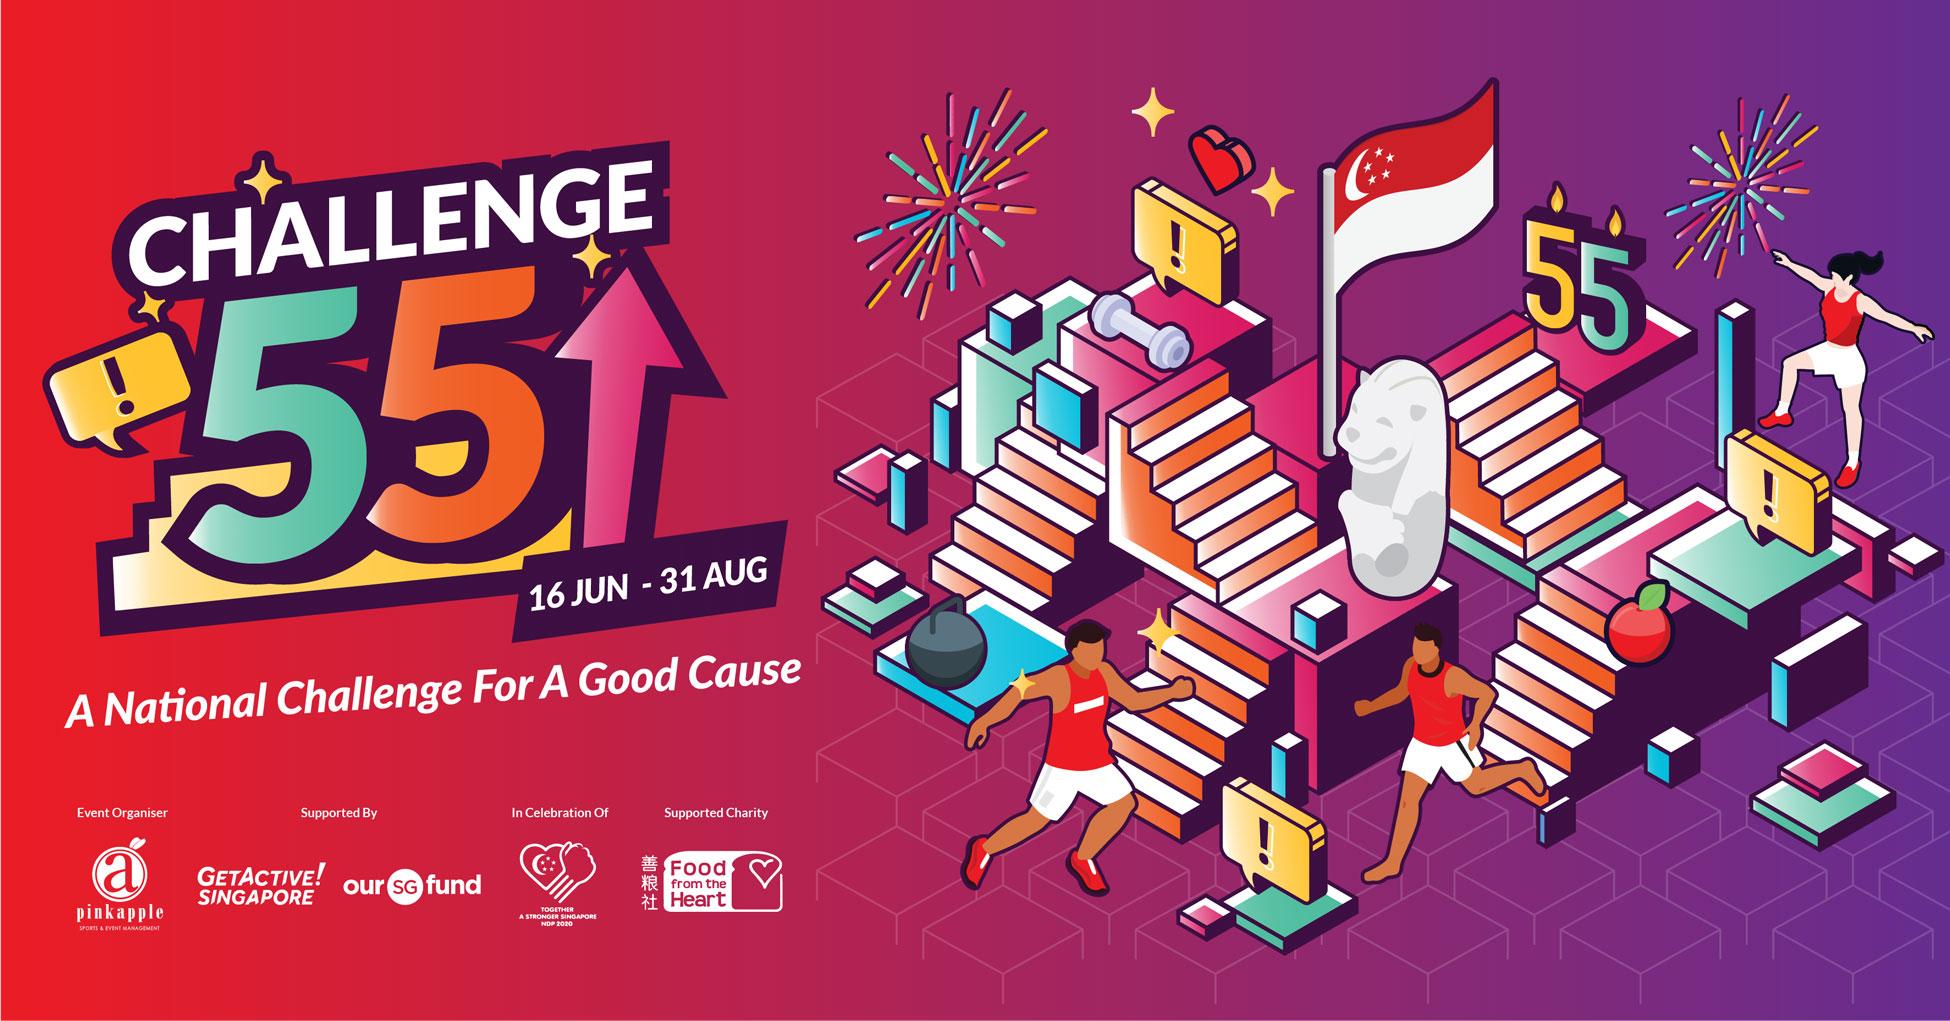 Logo of Challenge 55 SG 2020